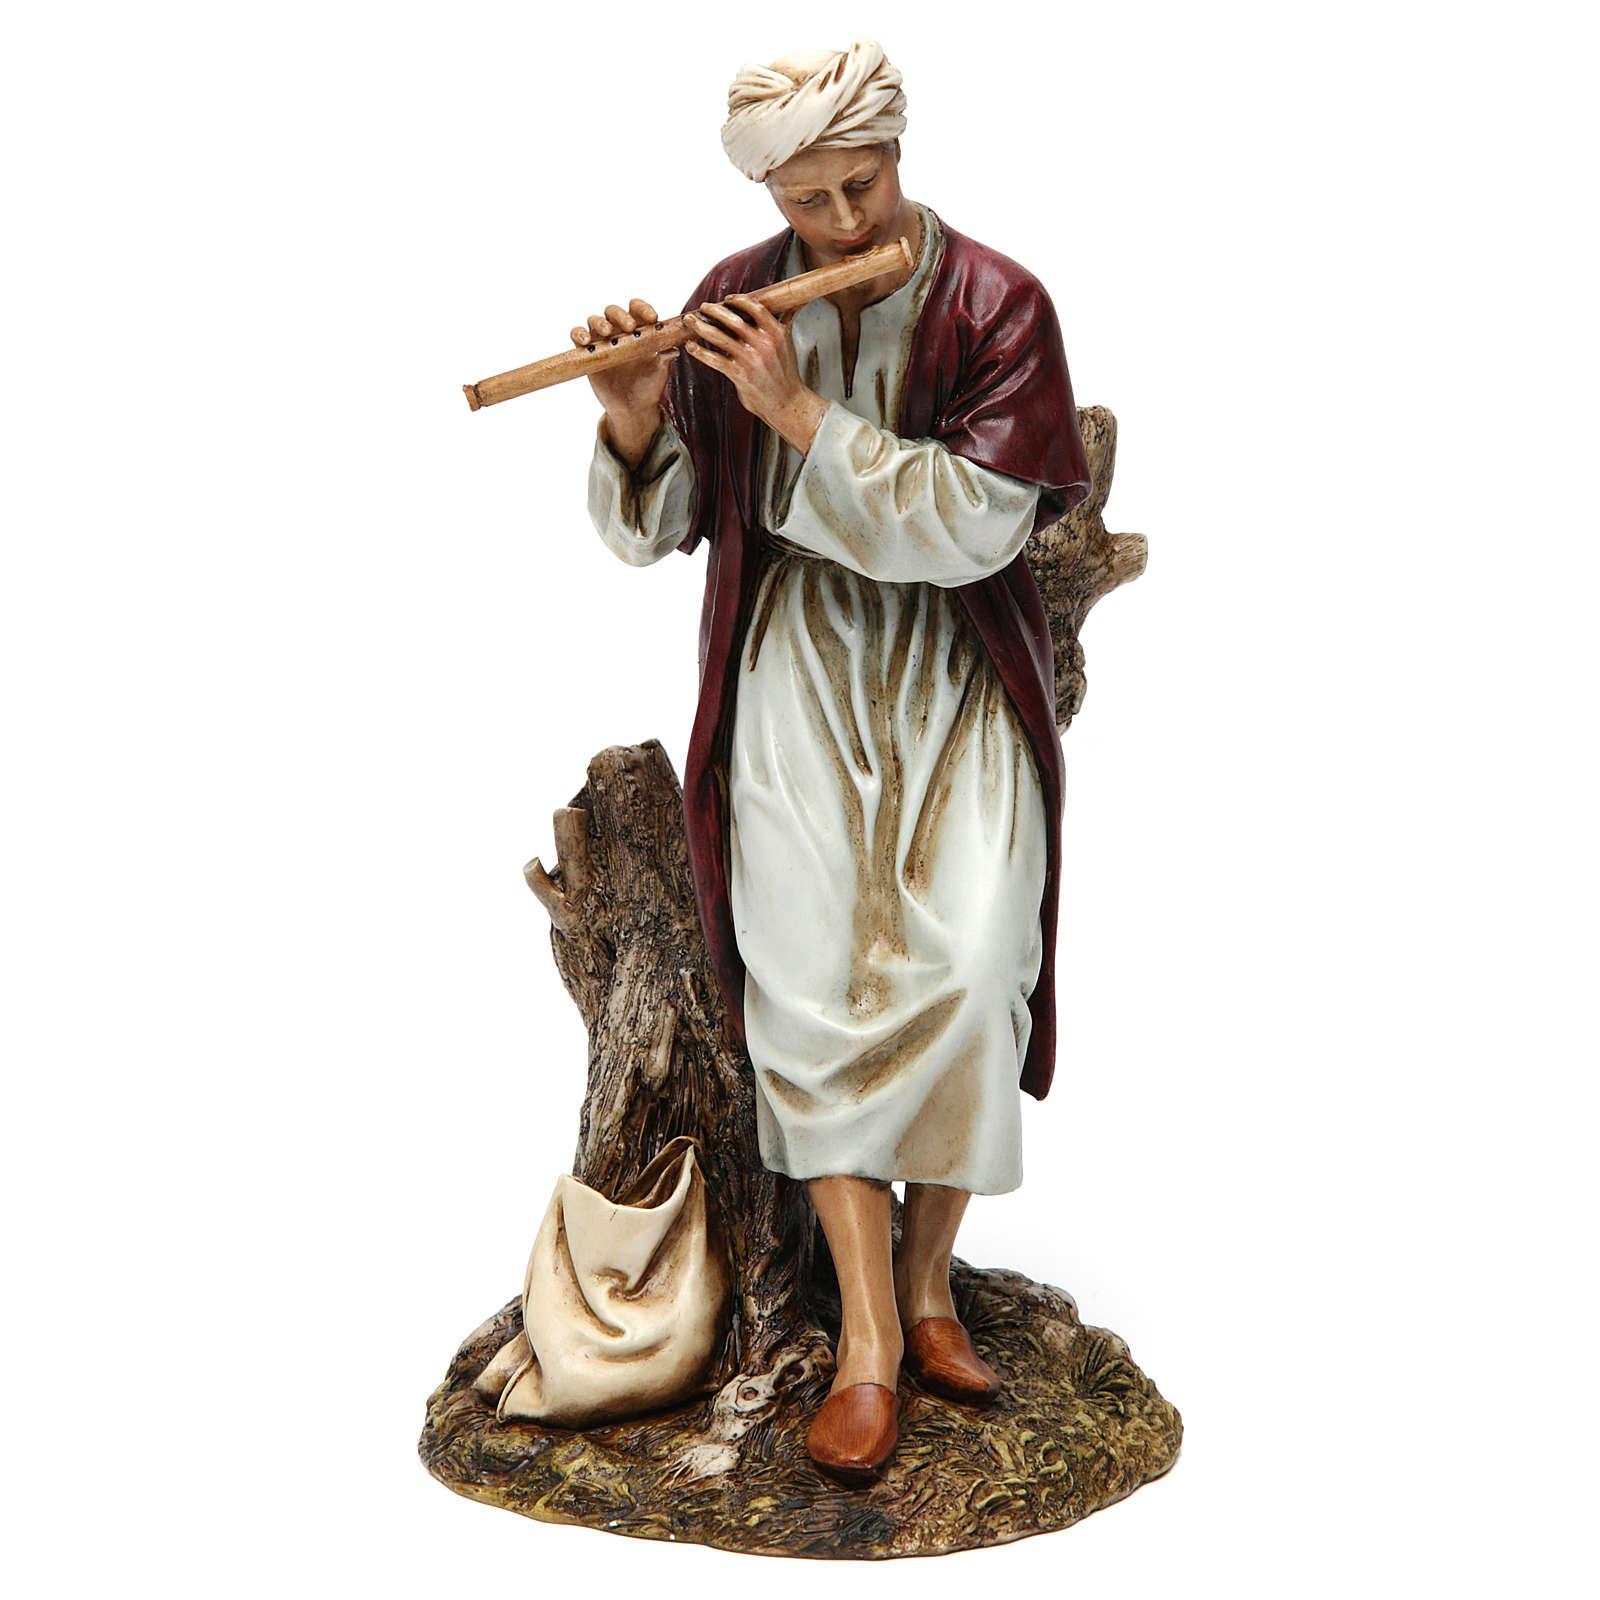 Flautista resina para presépio 20 cm Moranduzzo 4